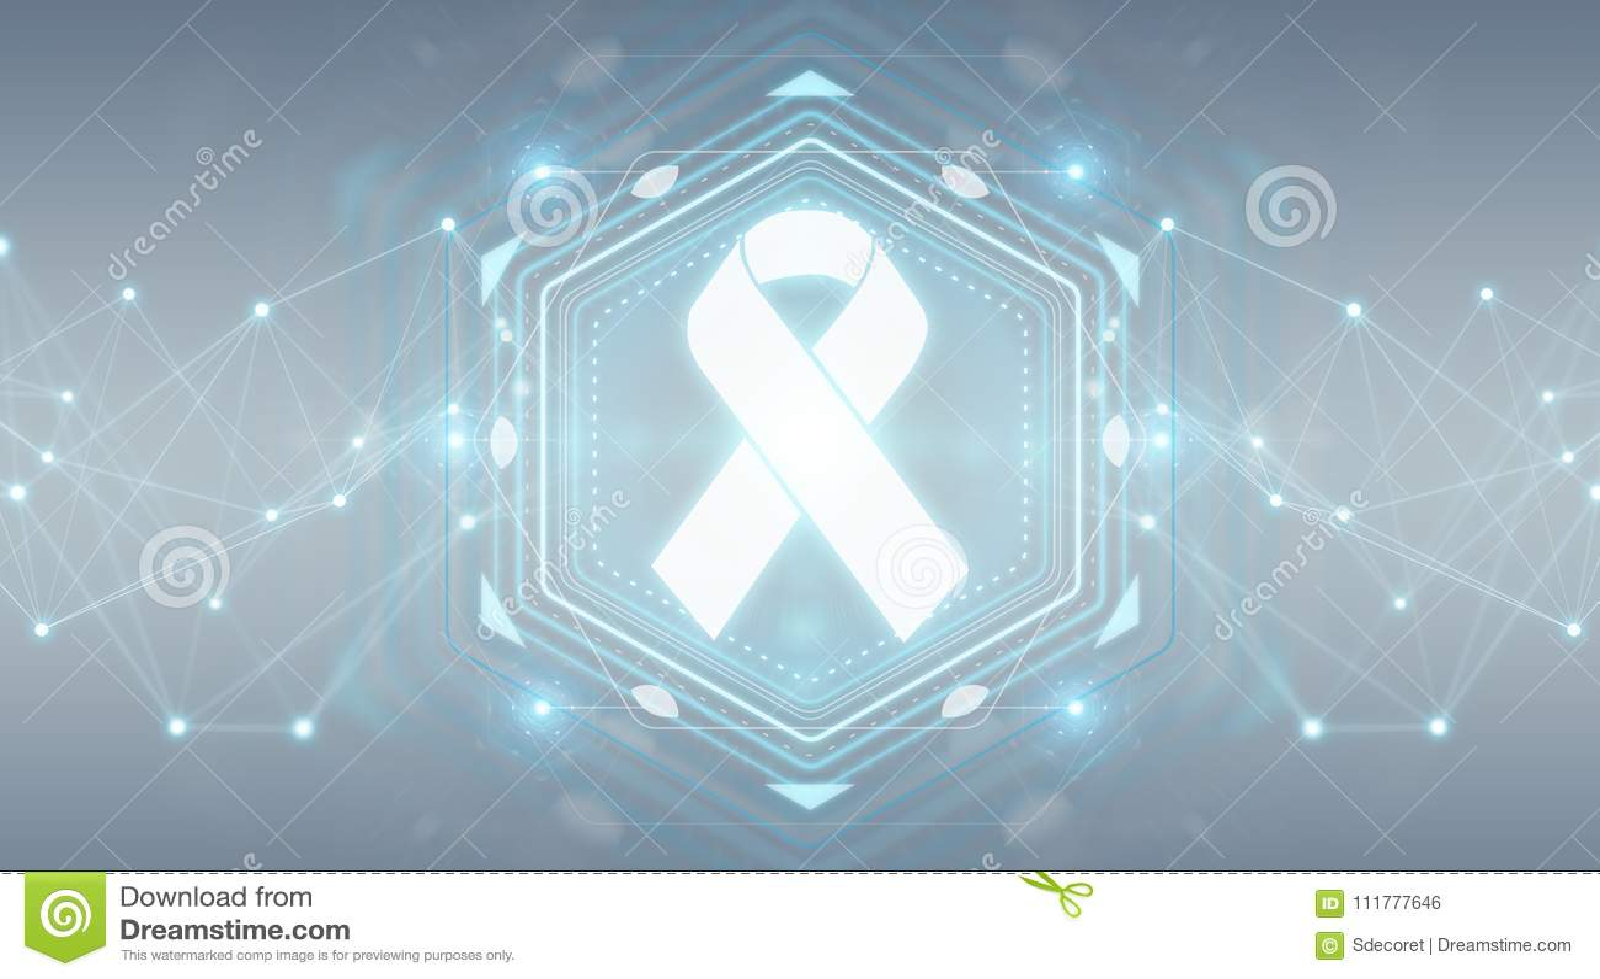 Digital ribbon cancer interface 3D rendering